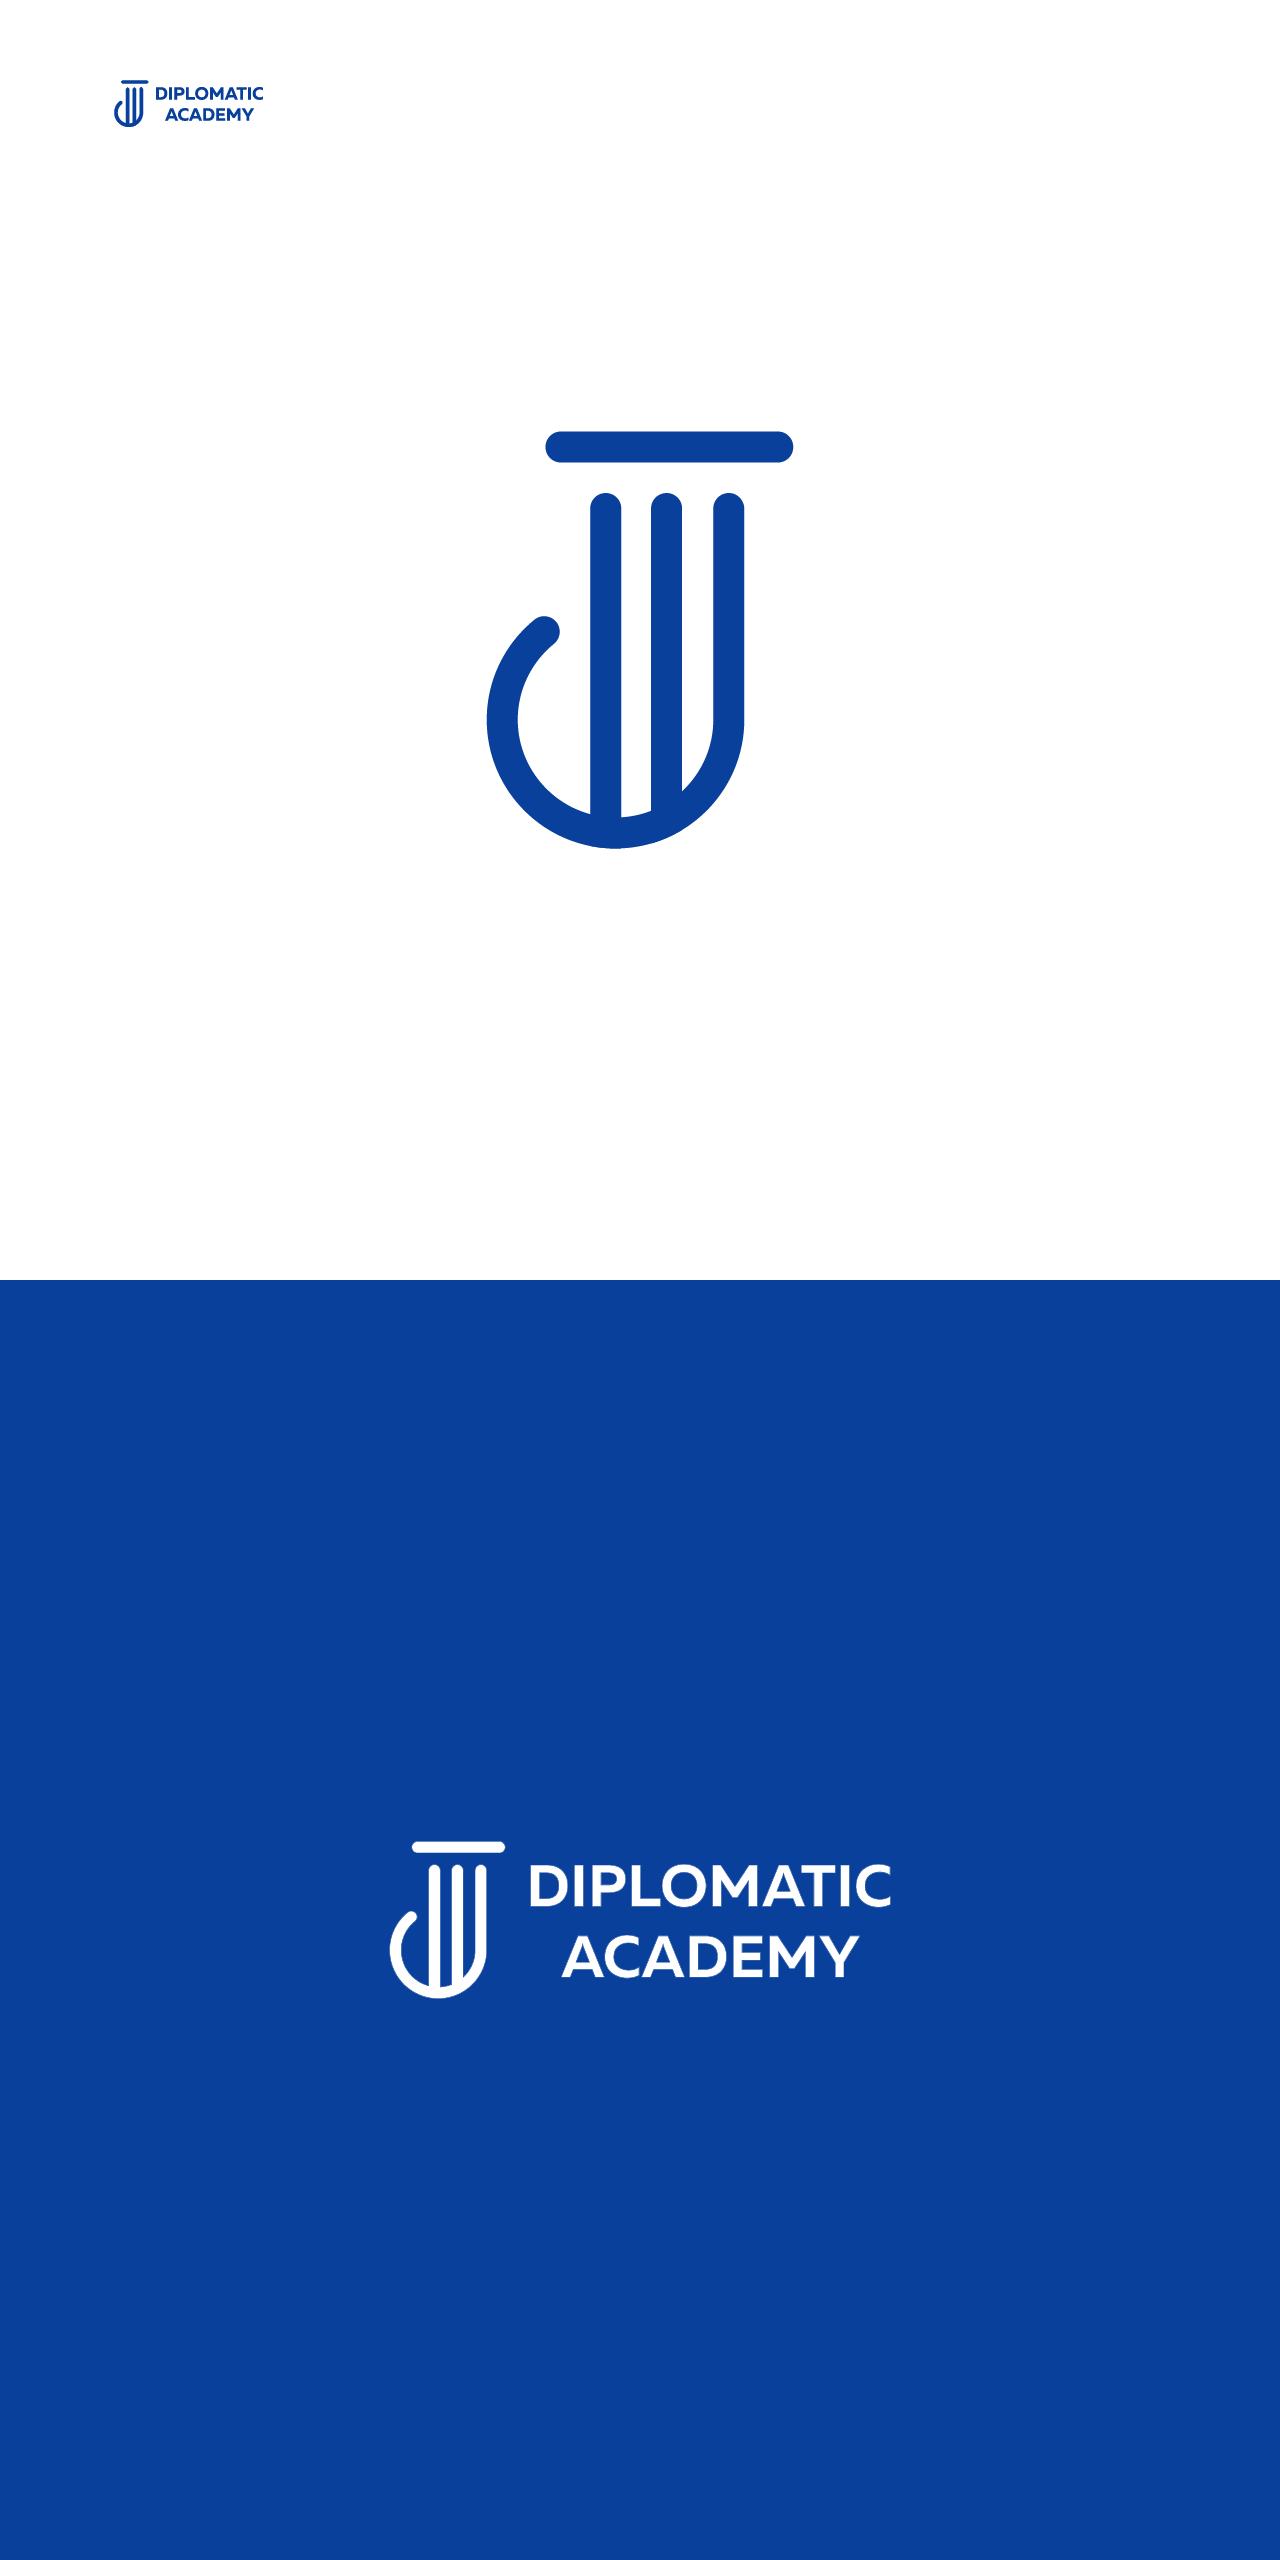 DiplomaticAcademy